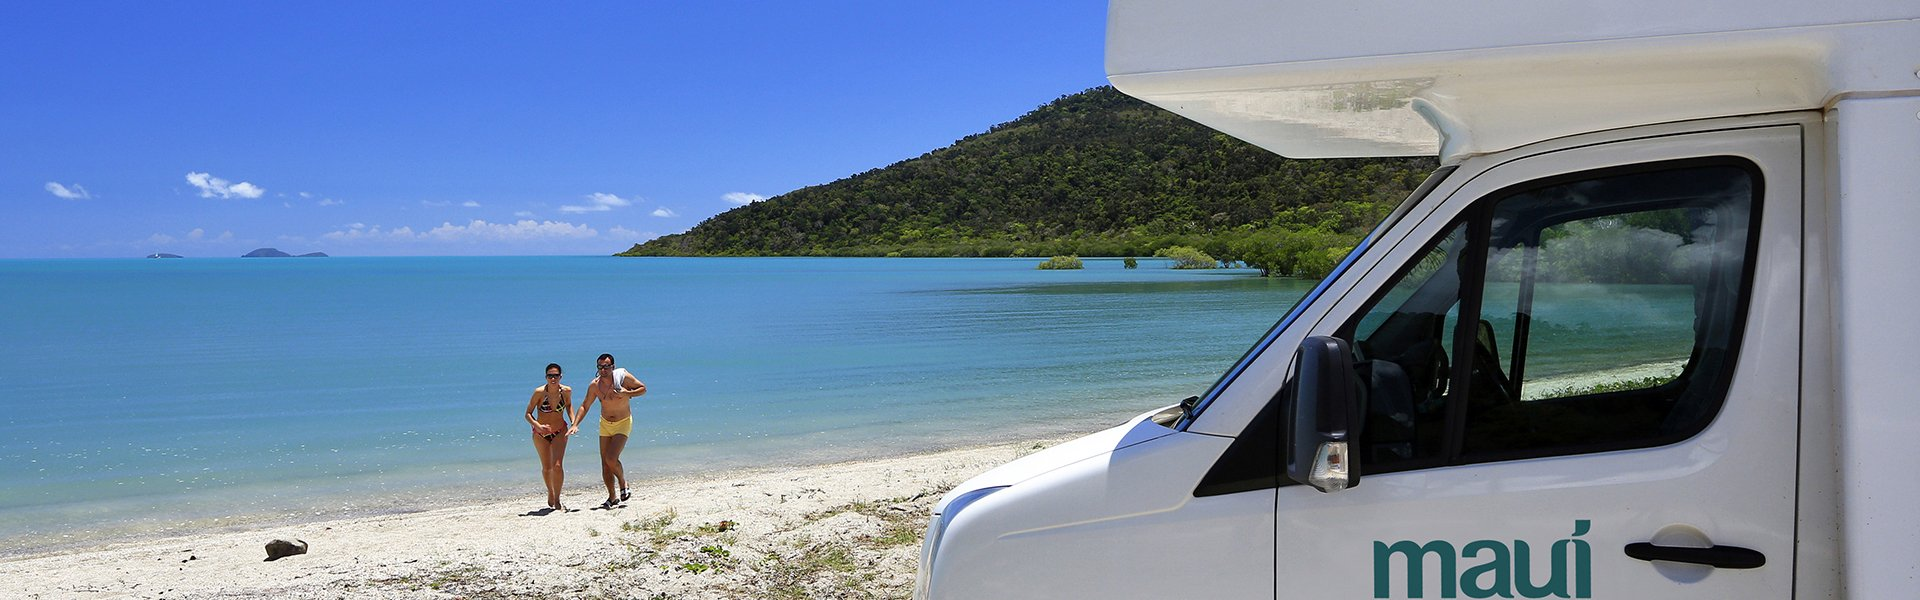 Maui Australië